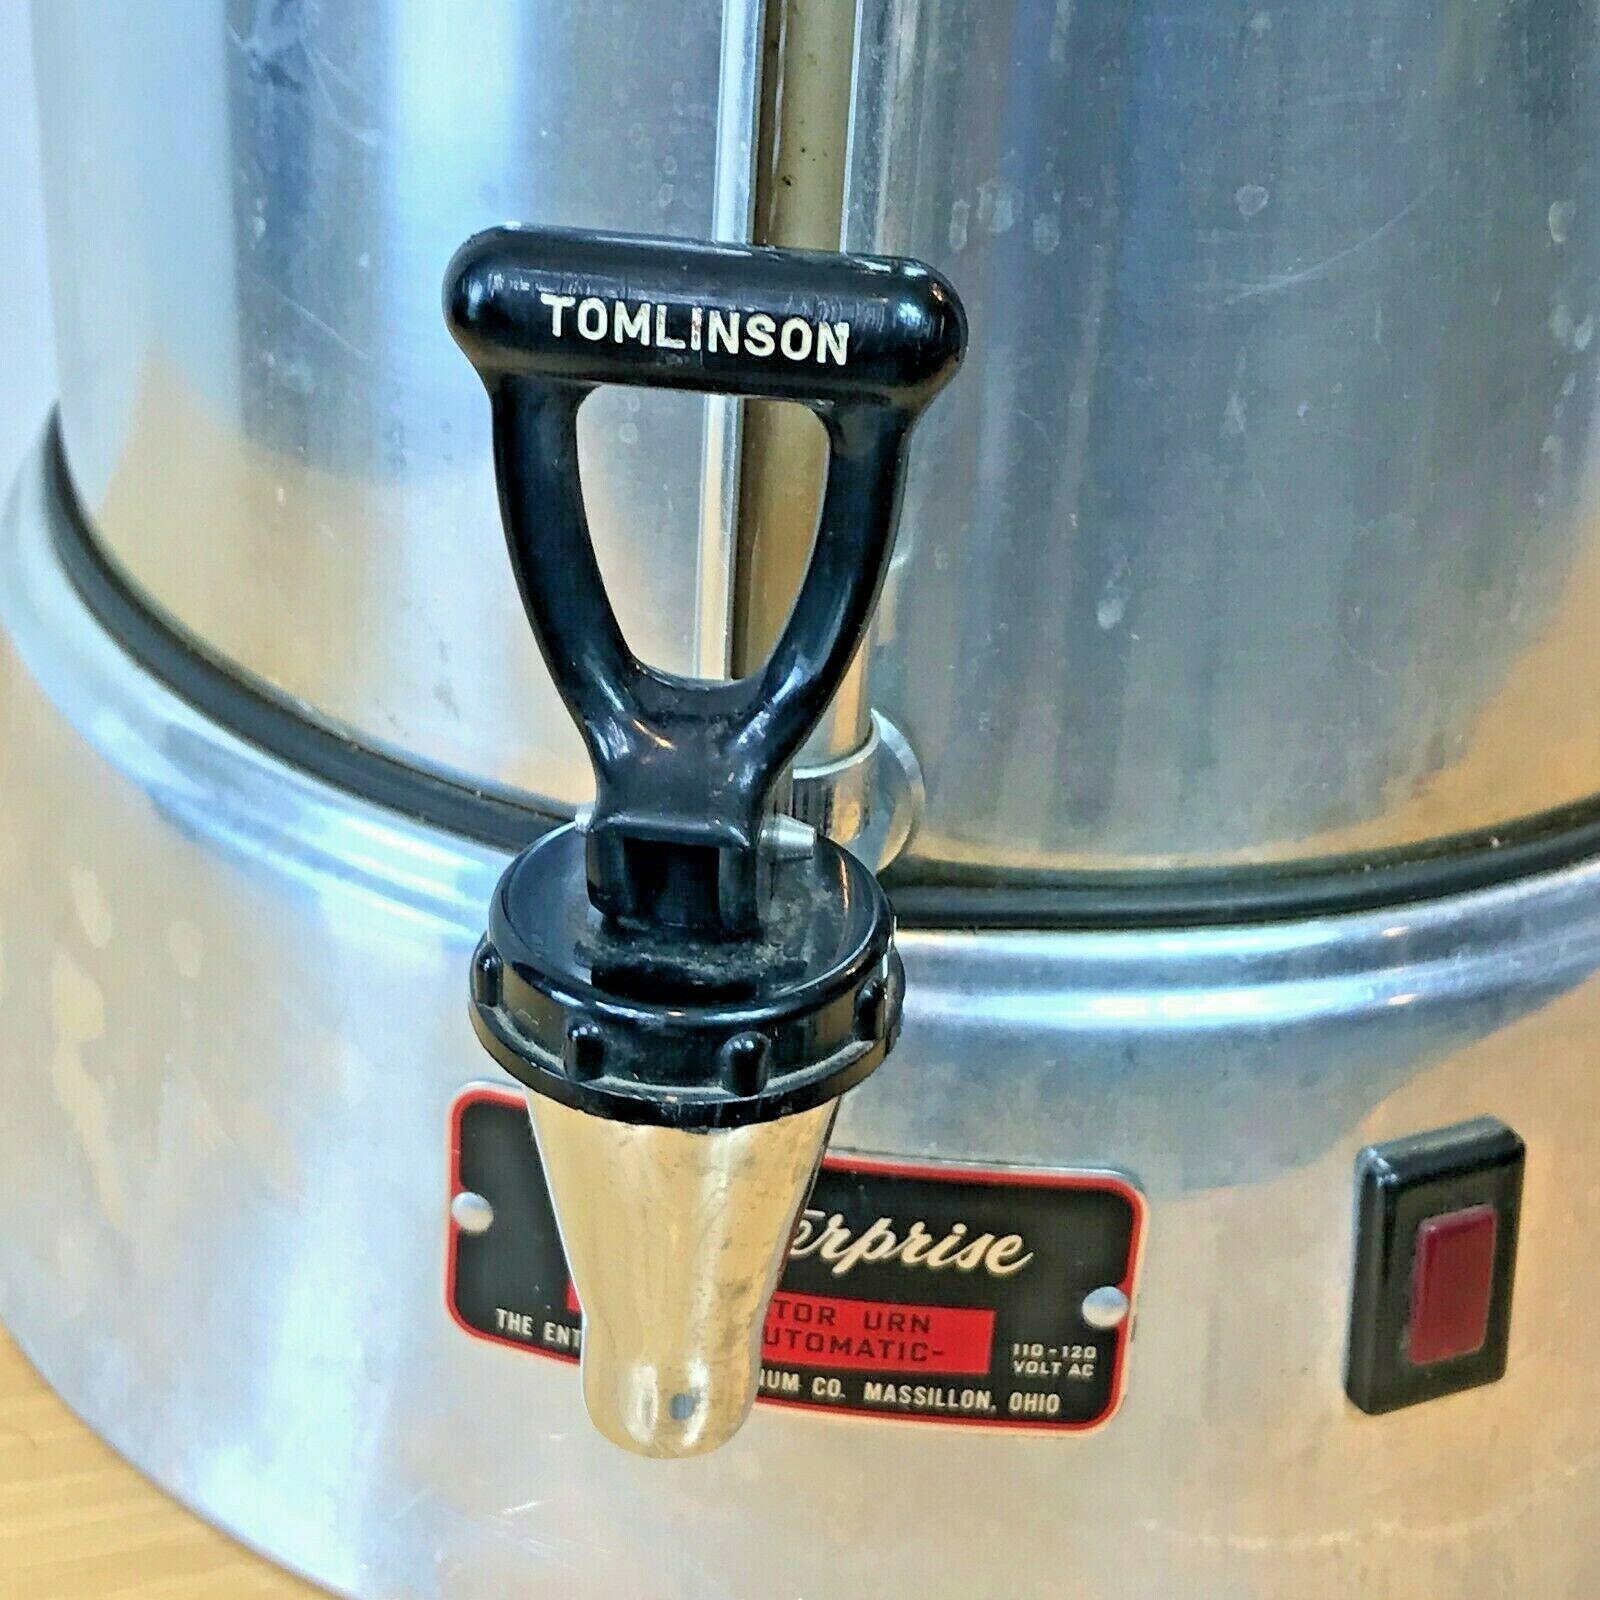 Vintage Enterprise Coffee Percolator 58 cup Urn Model AP48N WORKS Glass Knob LB image 4